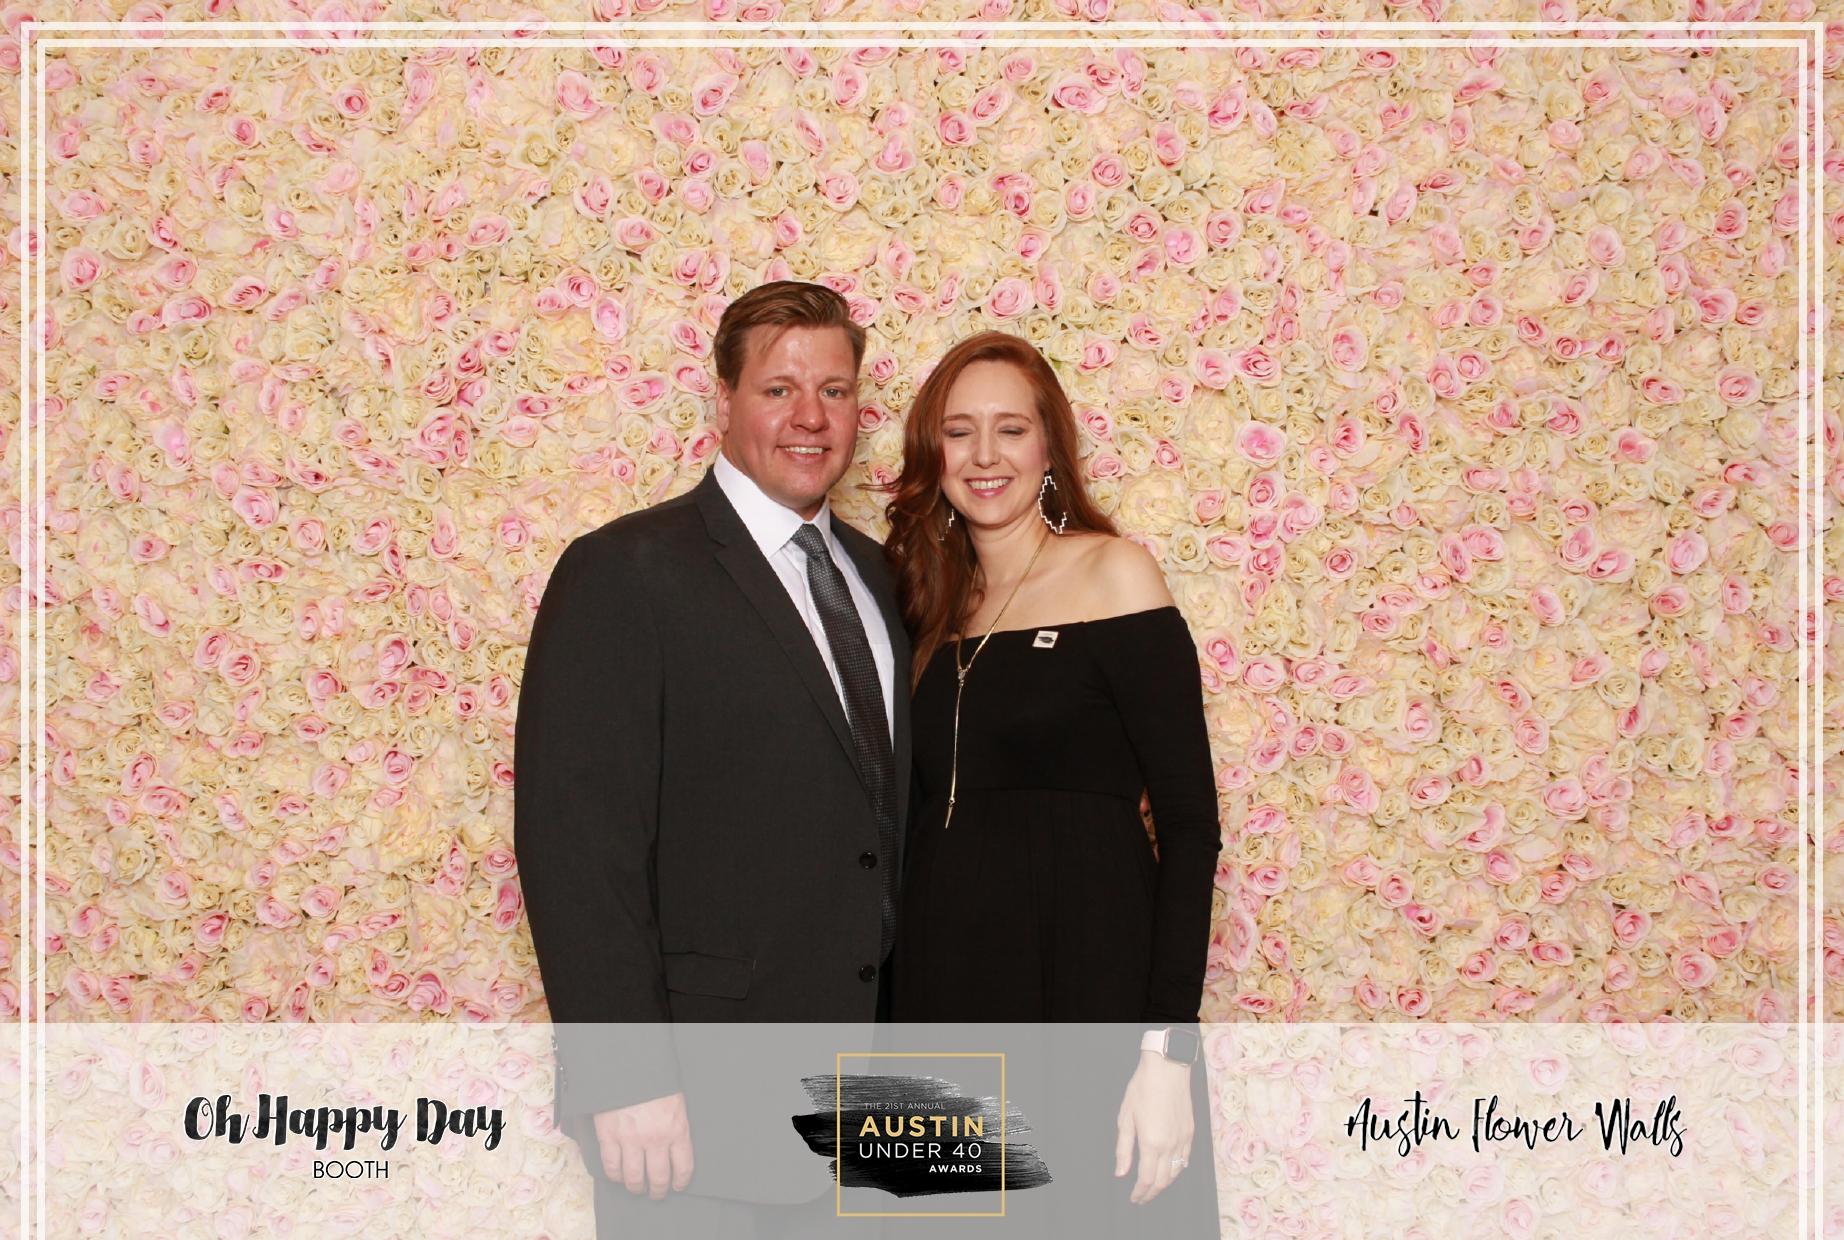 Oh Happy Day Booth - Austin Under 40-55.jpg